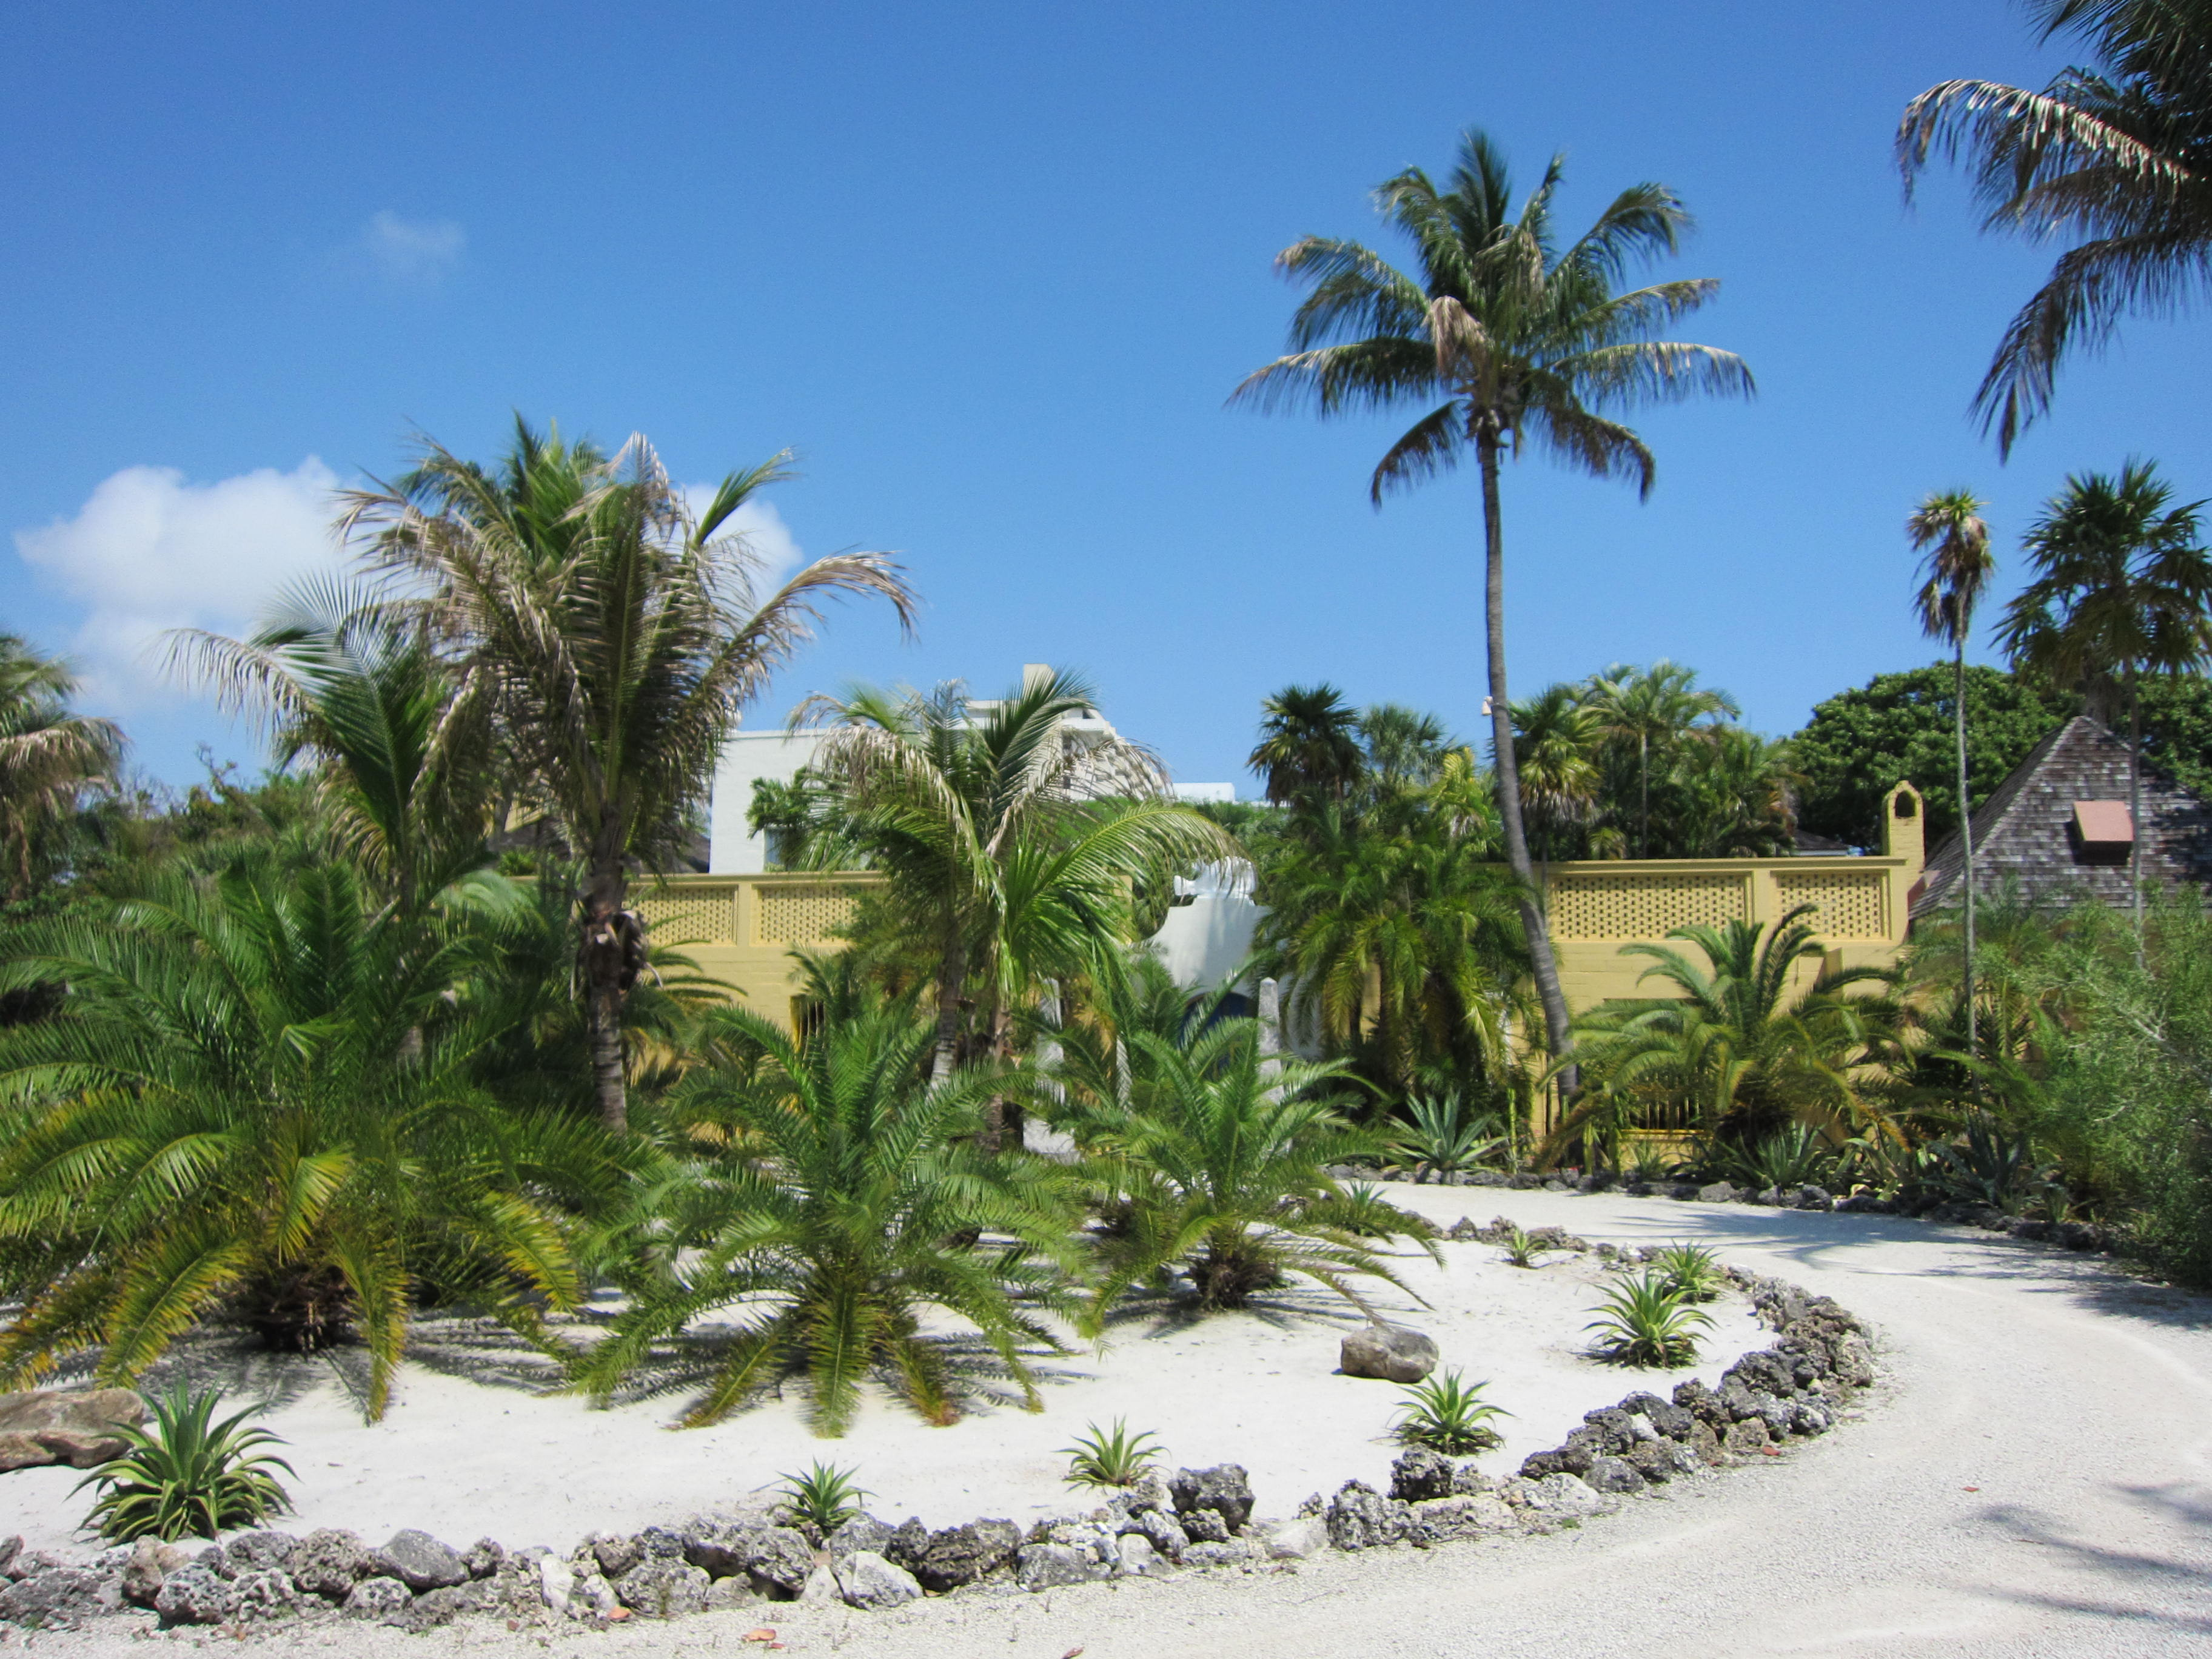 Economy Of Fort Lauderdale Florida